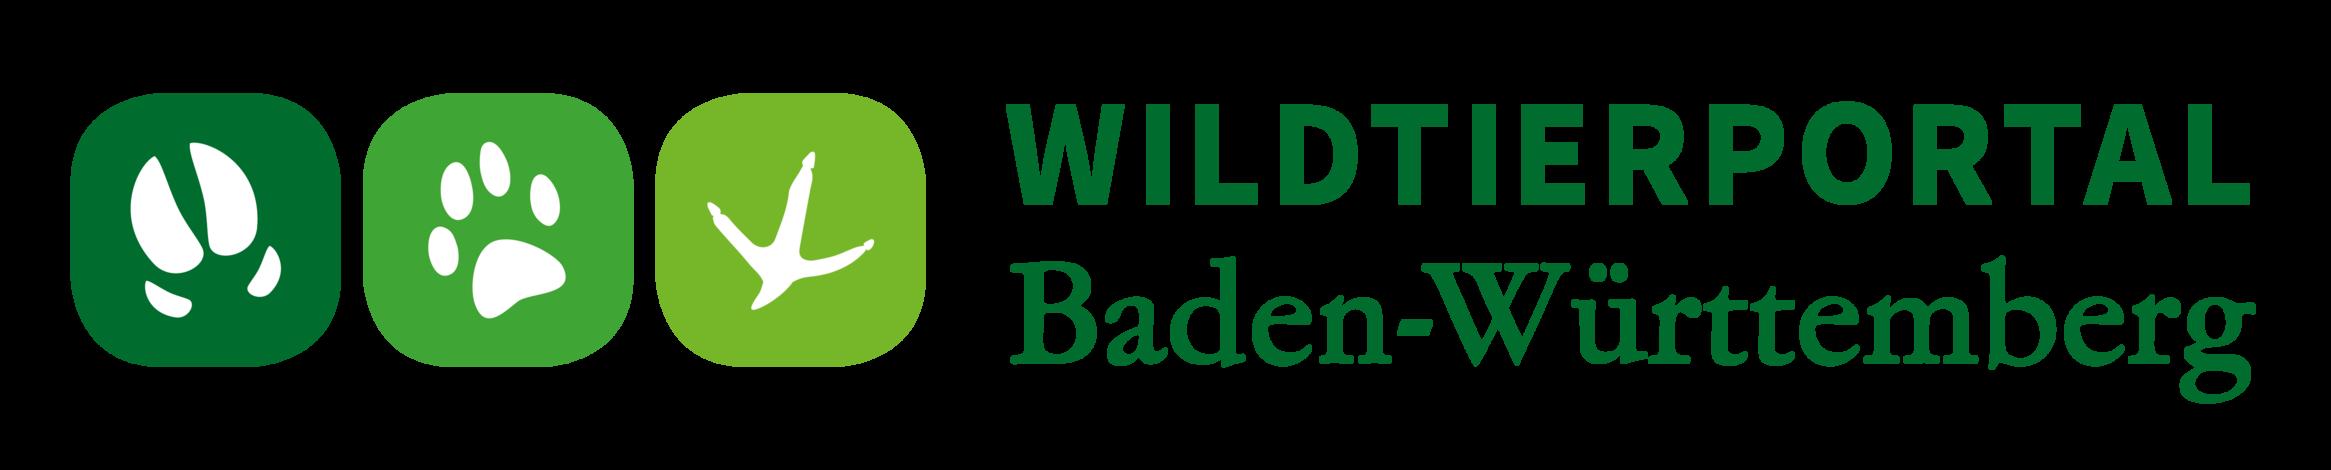 wildtierportal-bw.de